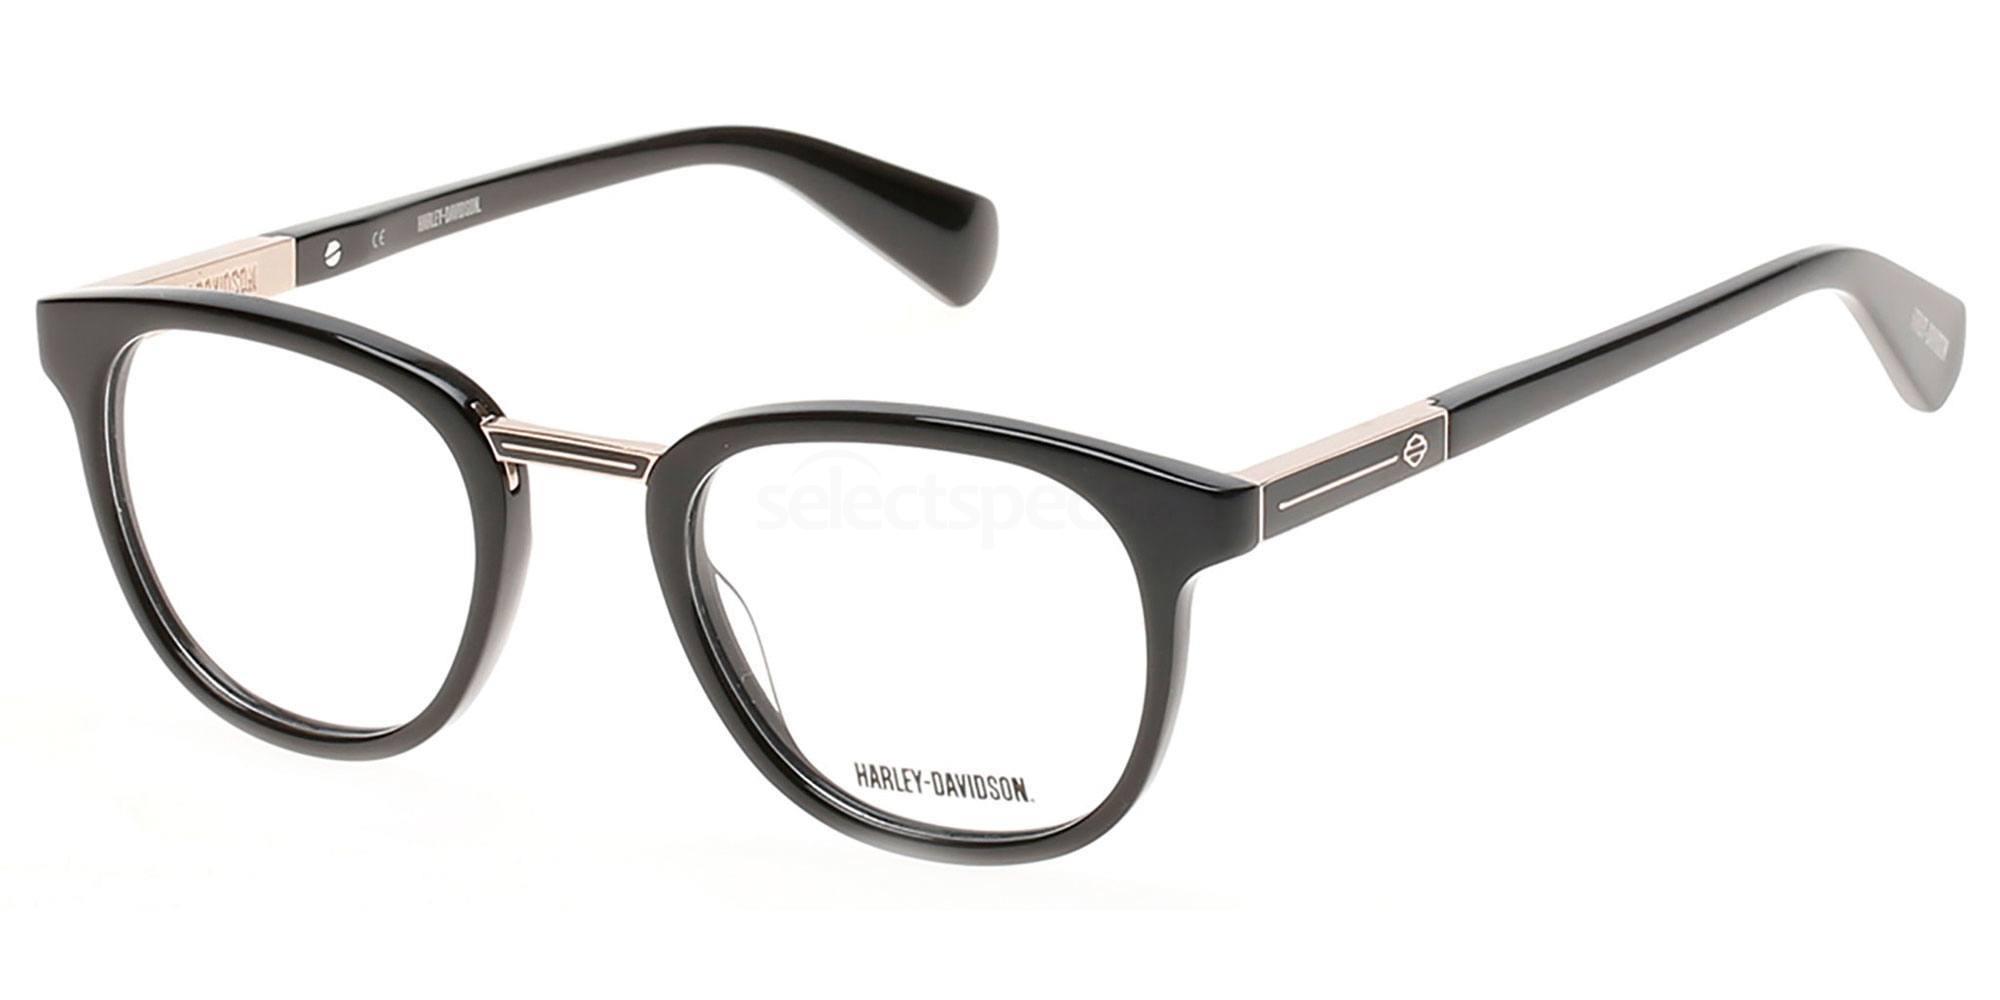 005 HD 1002 Glasses, Harley Davidson